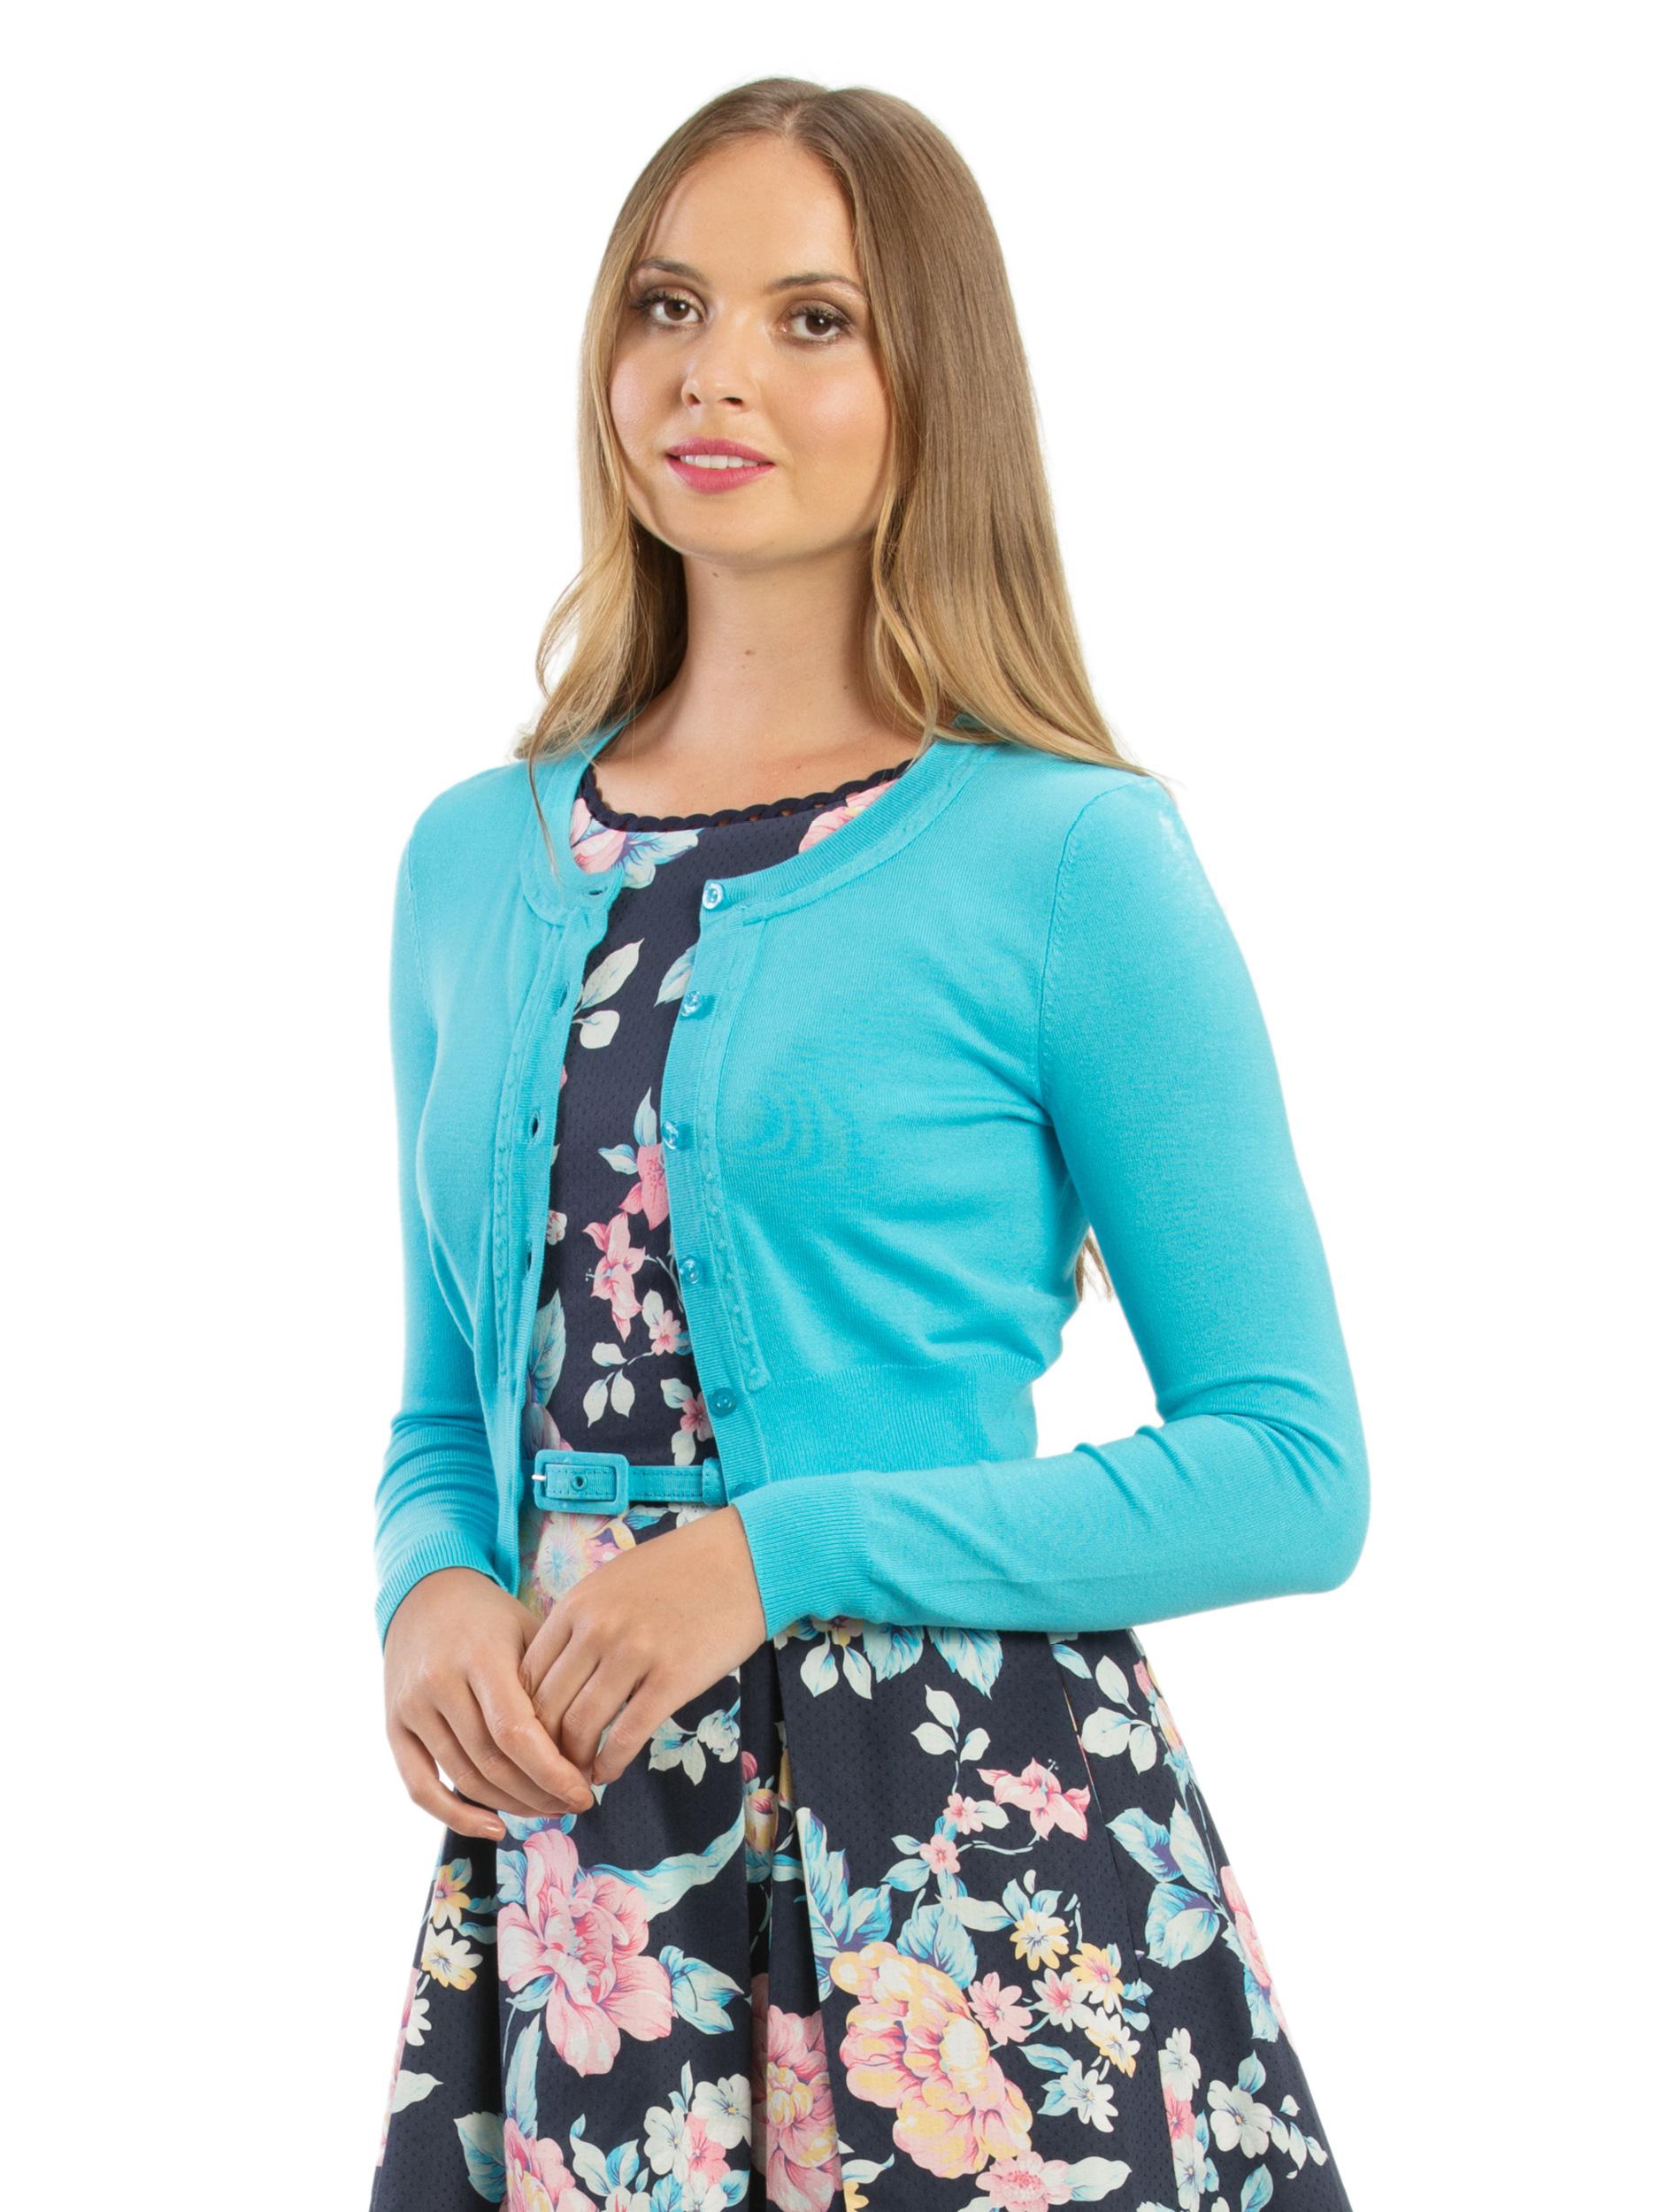 53eb2c263a6 New Review Women  039 s Chessie Long Sleeve Cardi Aqua